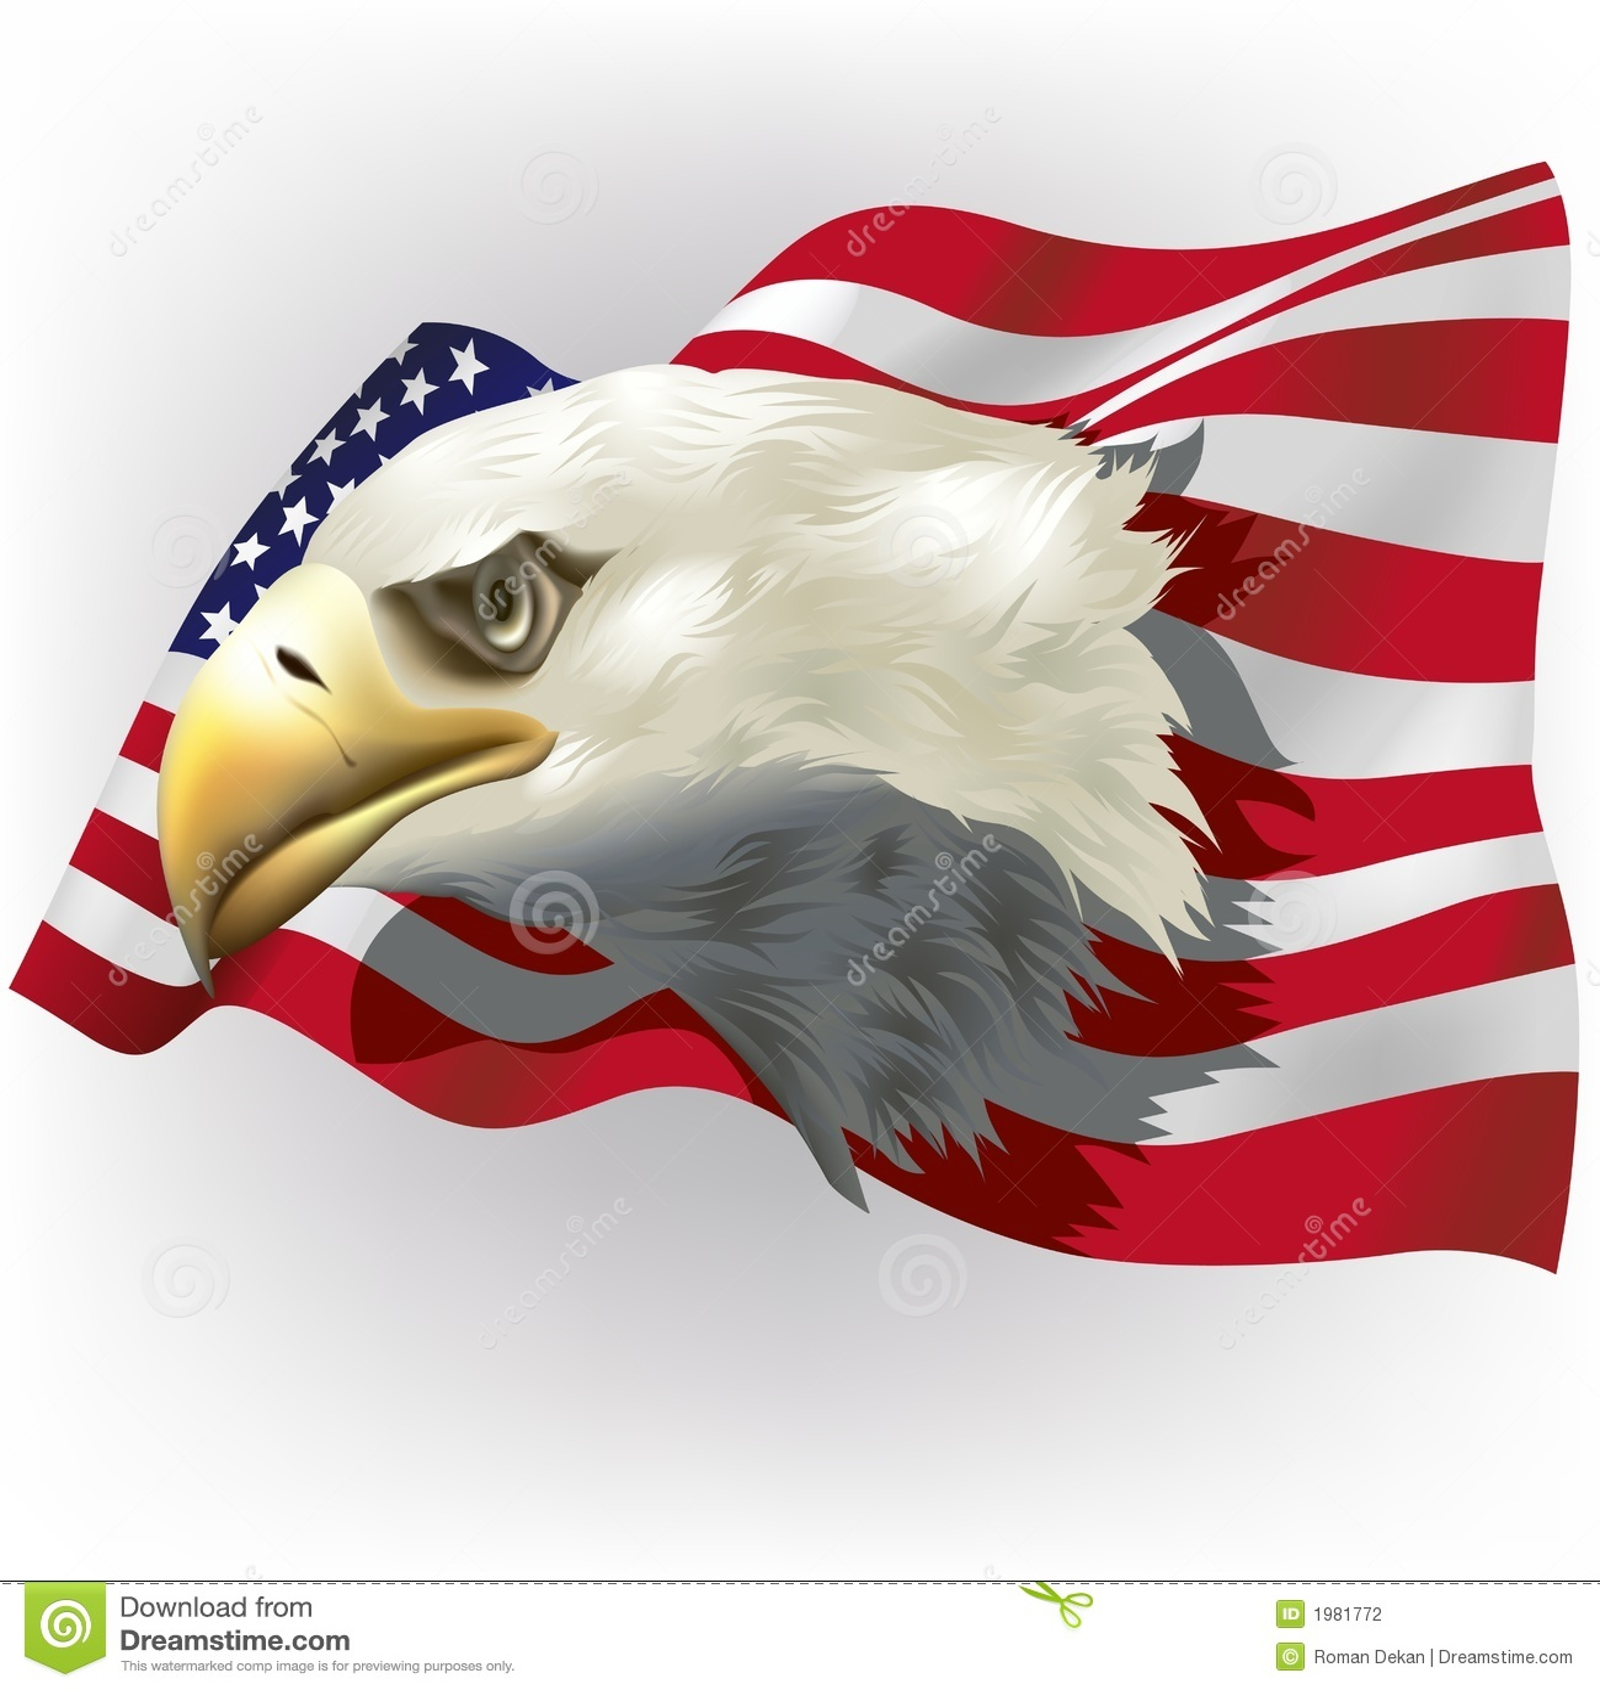 US-patriotisches Thema